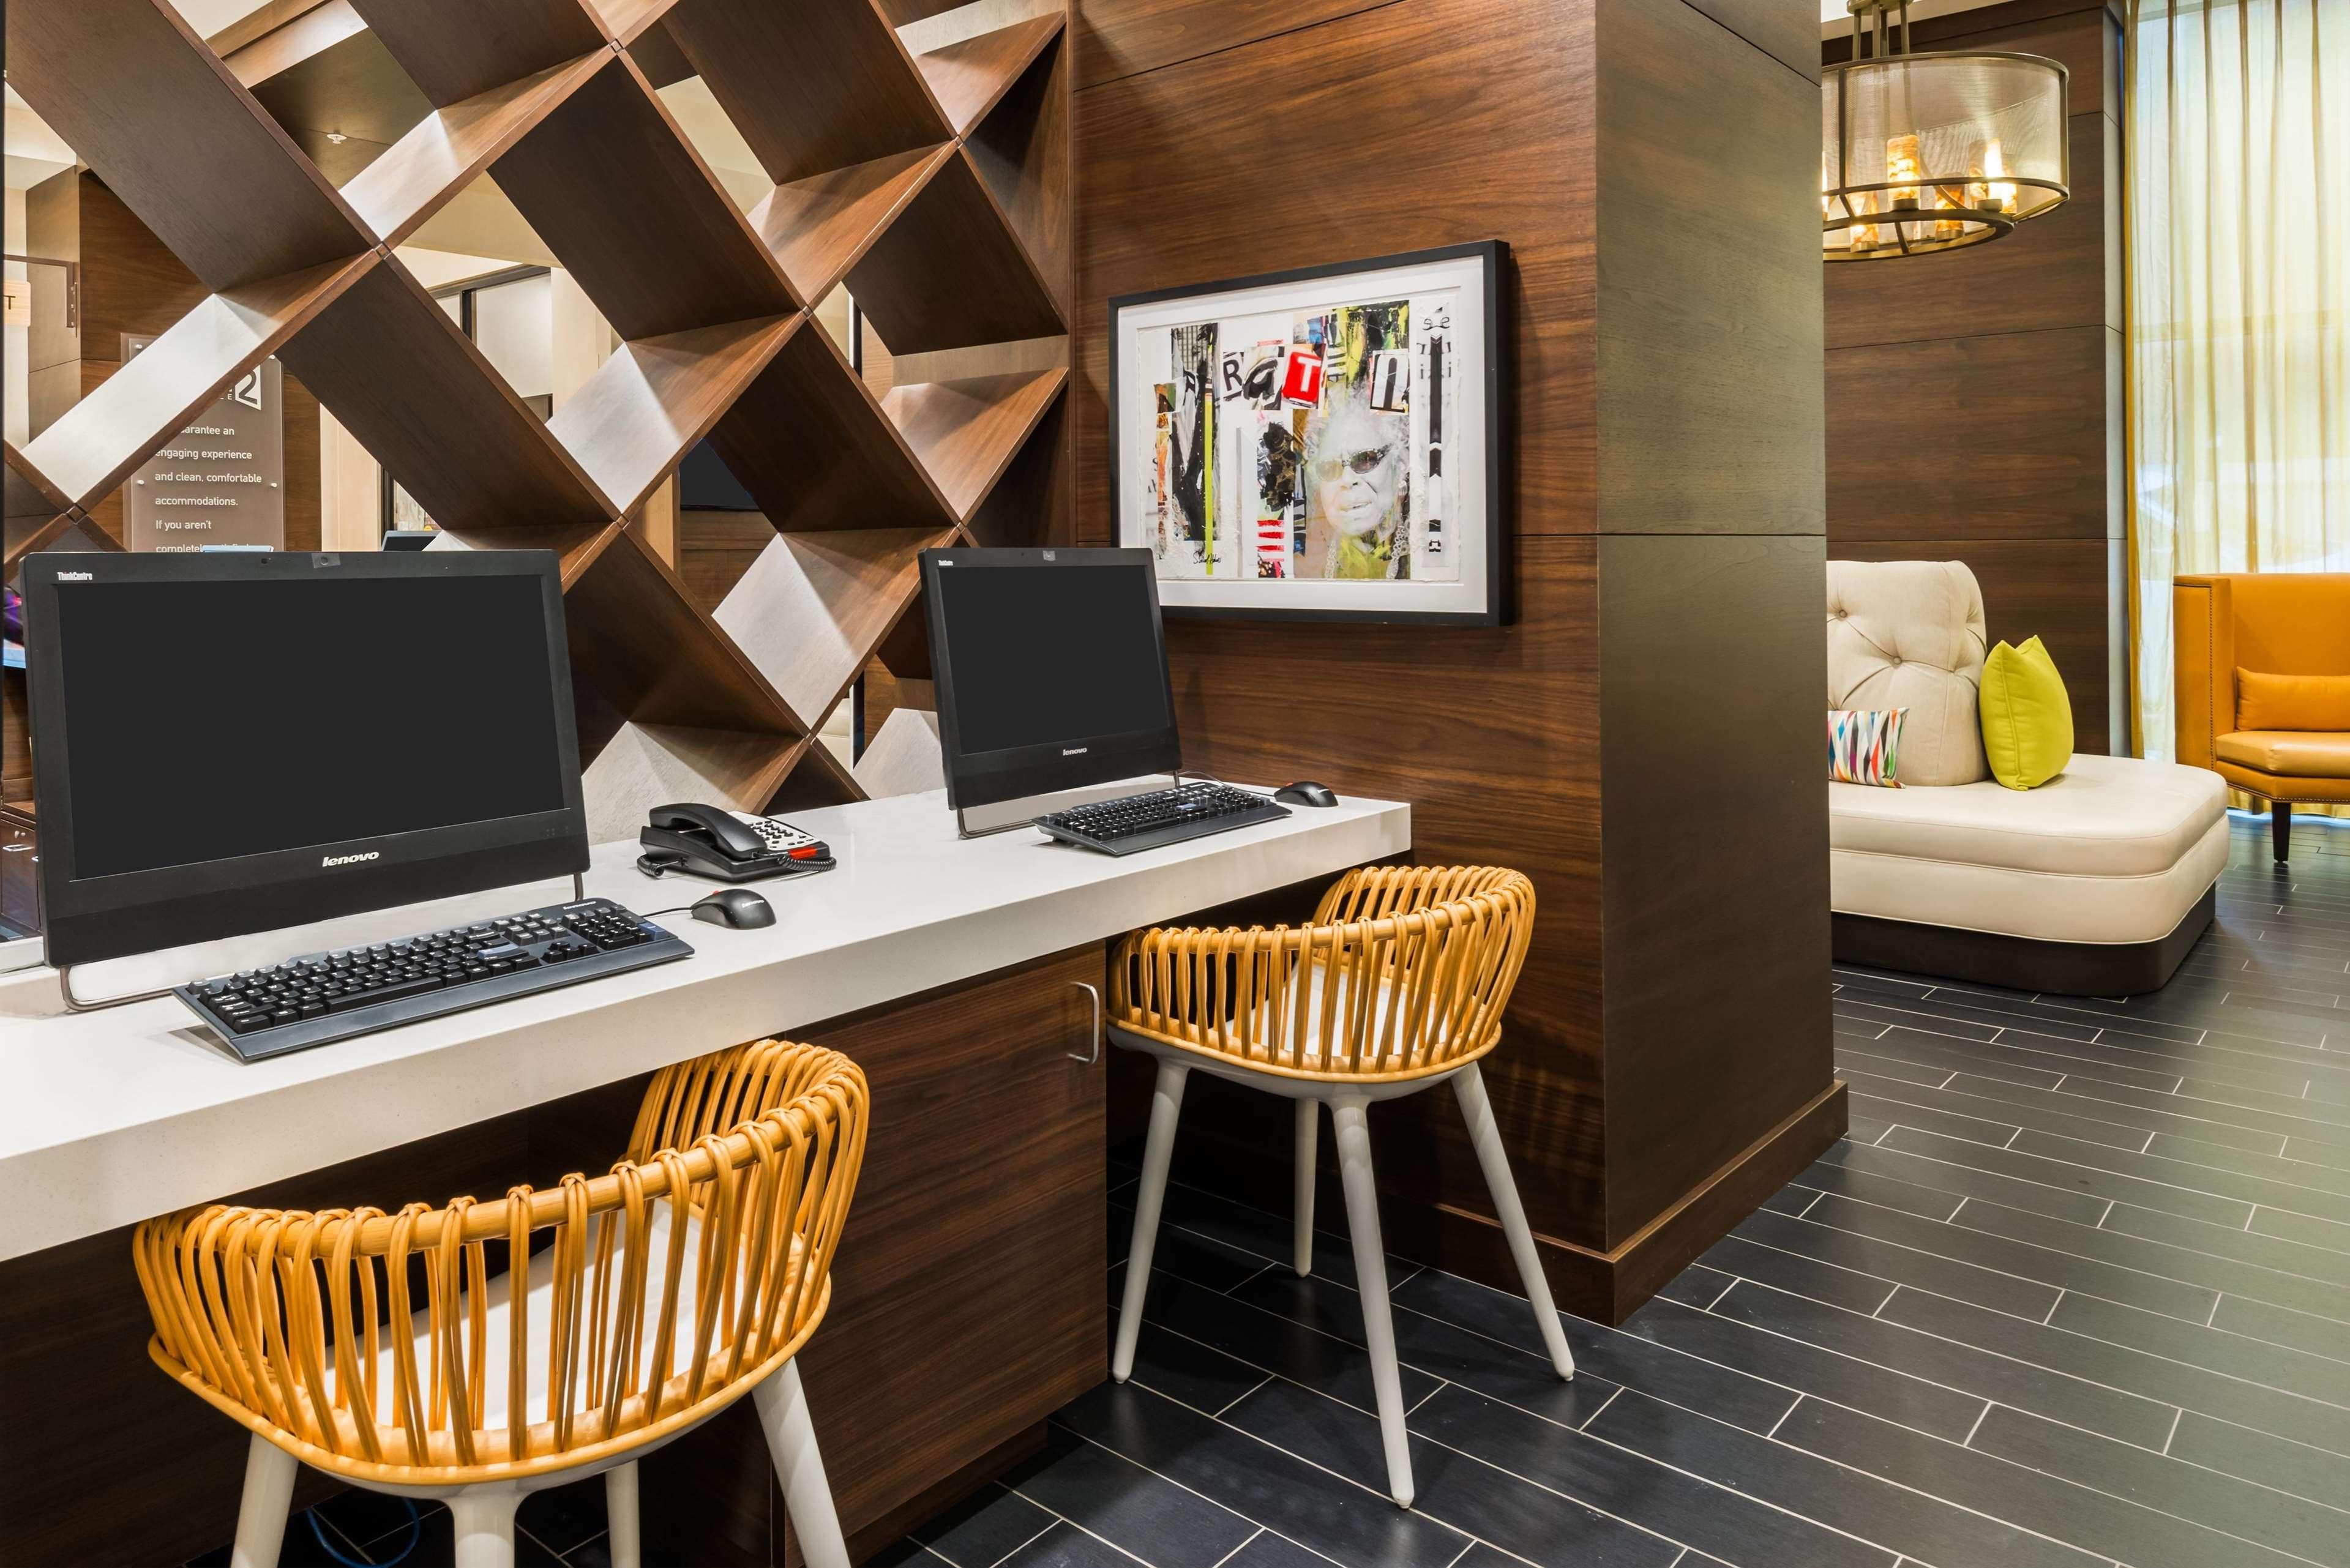 Home2 Suites by Hilton Atlanta Downtown image 7